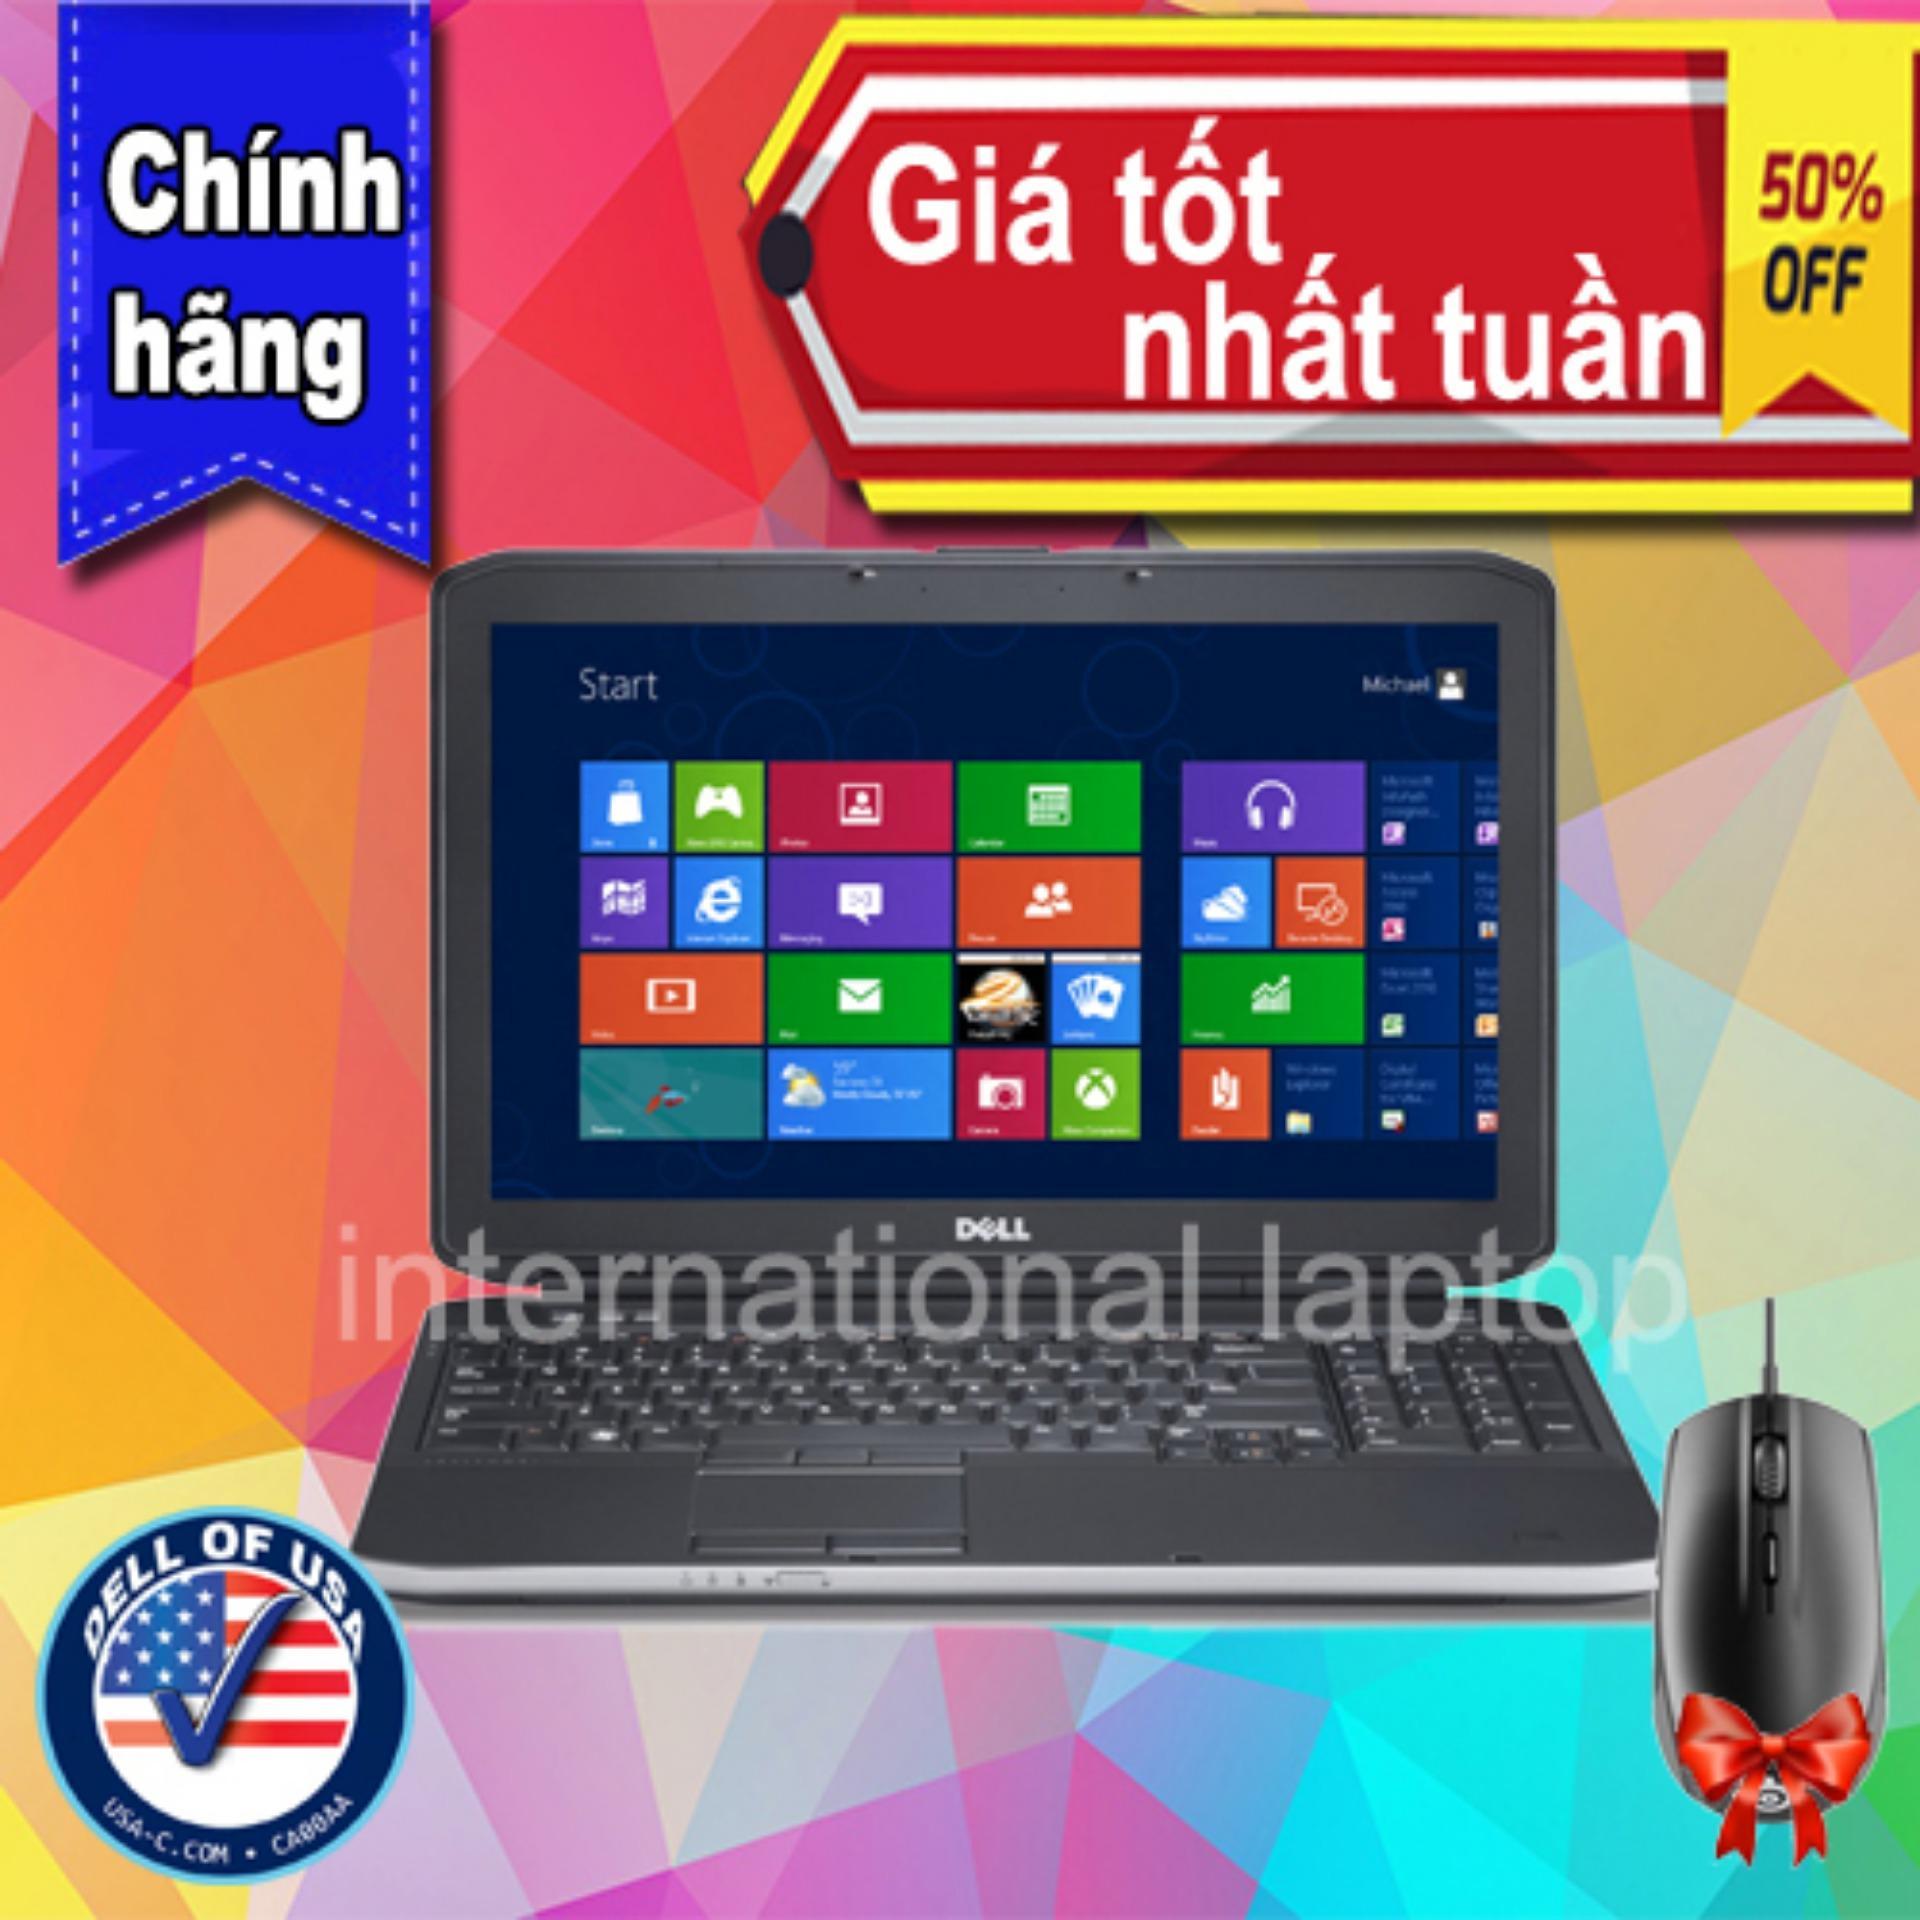 Cửa Hàng Laptop Dell Latitude E5530 I5 4 Ssd120 Hang Nhập Khẩu Dell Trong Vietnam